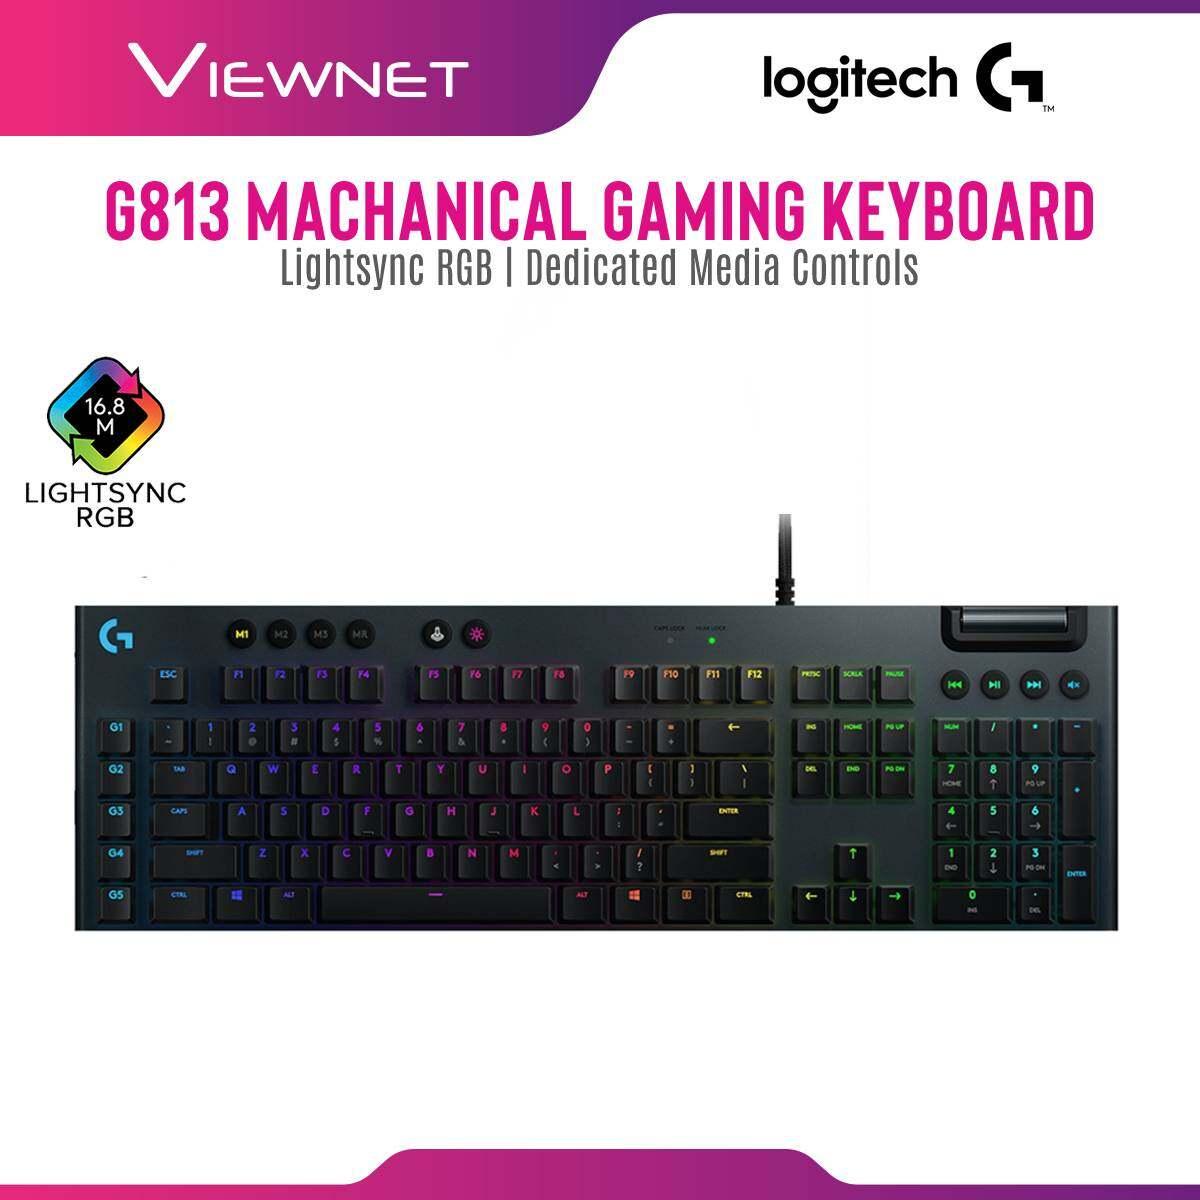 Logitech G813 Lightsync RGB Mechanical Gaming Keyboard (Tactile / Linear / Clicky) Ultra Thin, Logitech G HUB